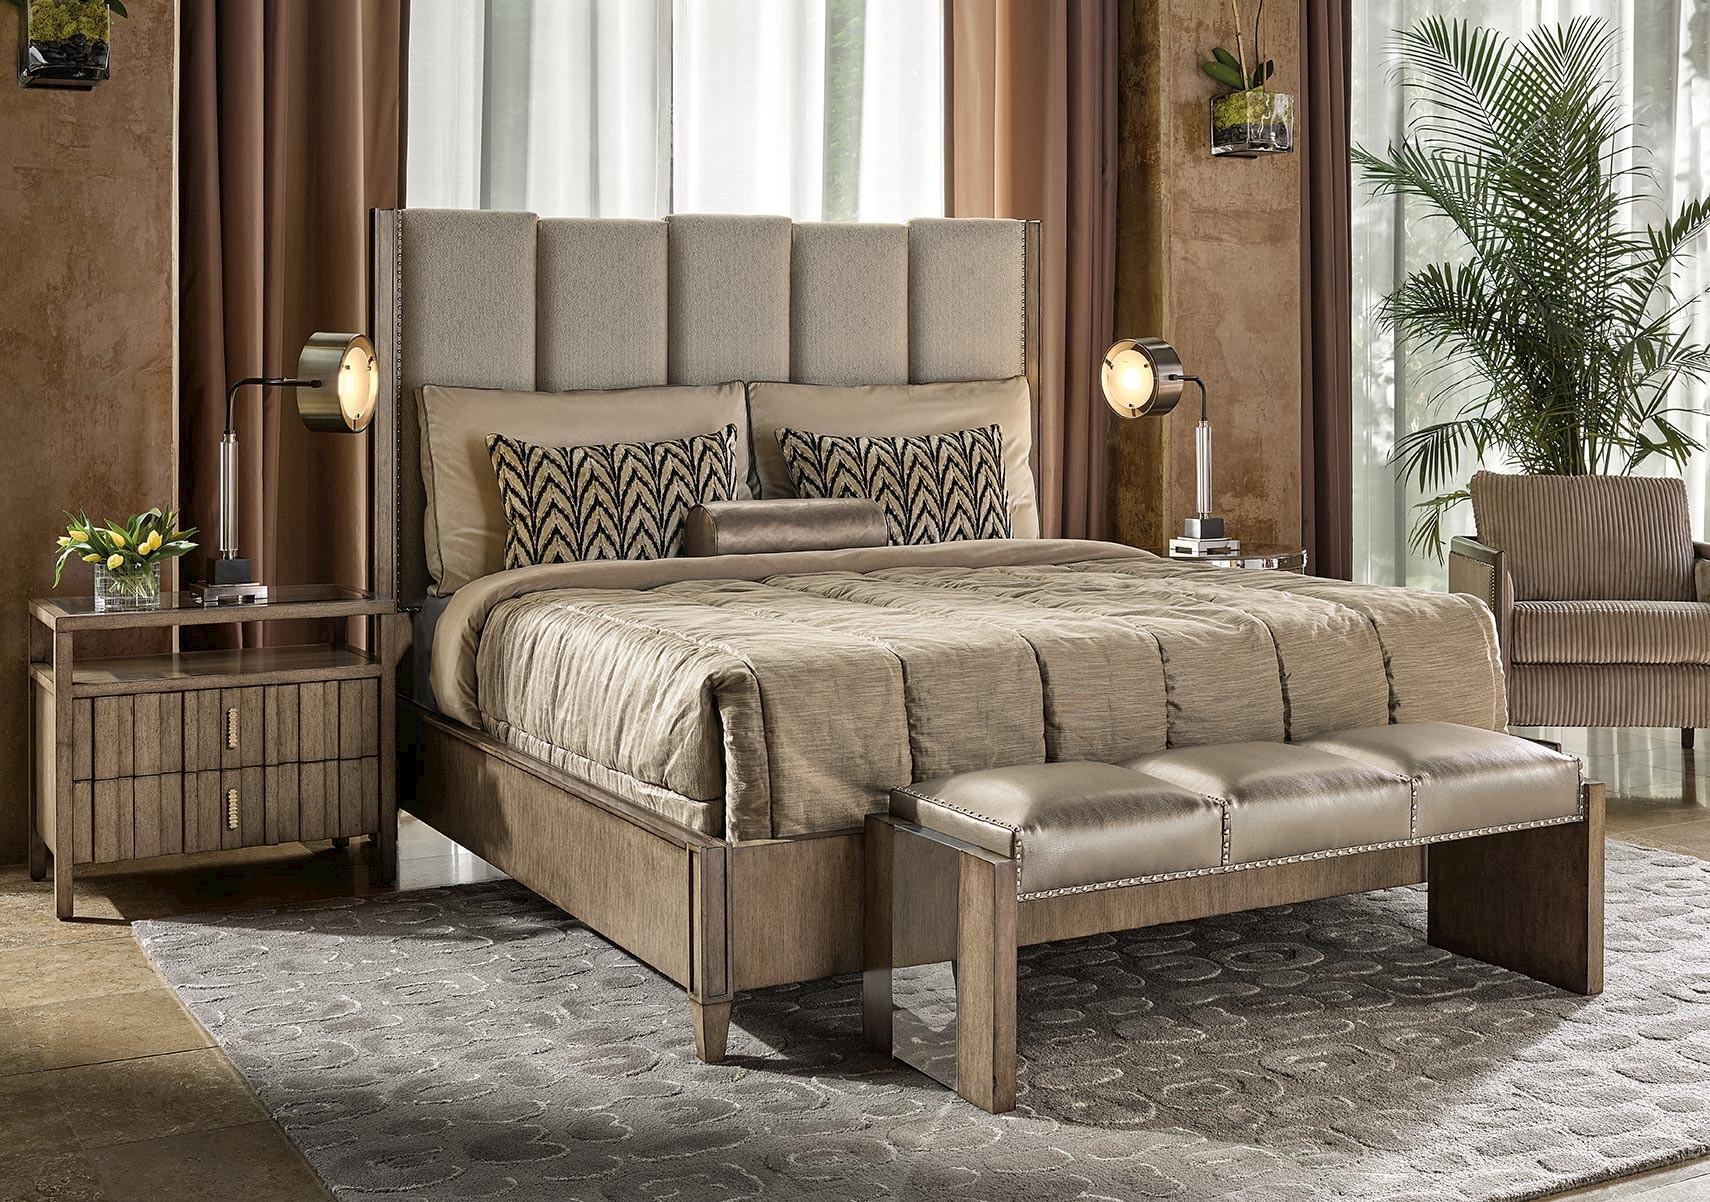 Beautiful Lacks Bedroom Furniture Ideas - Home Design Ideas ...